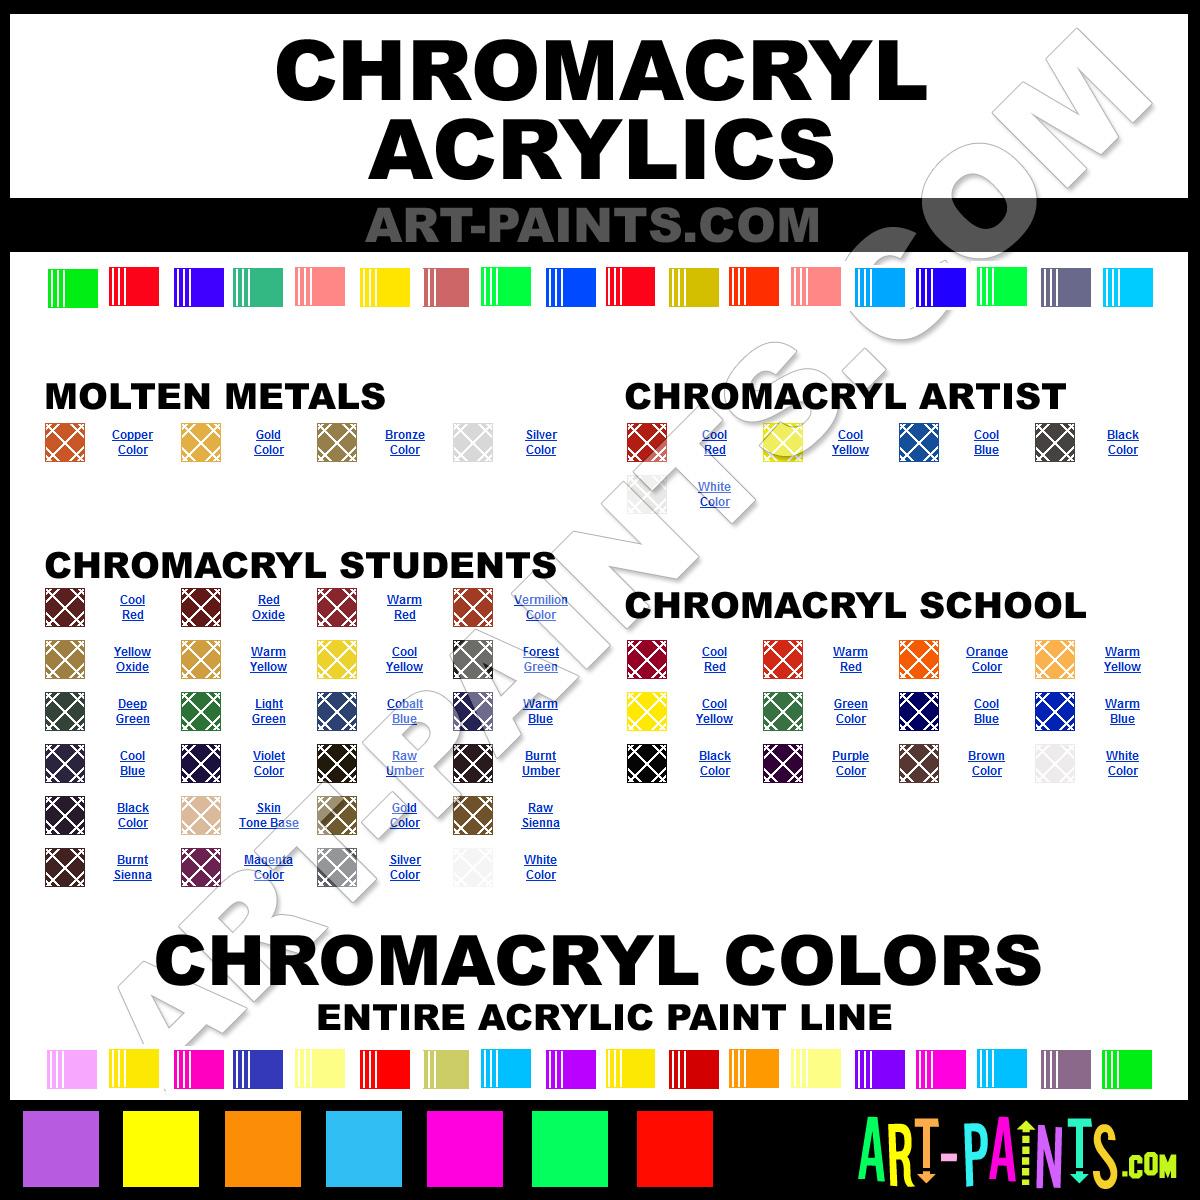 Paint Colors And Brands: Chromacryl Acrylic Paint Brands